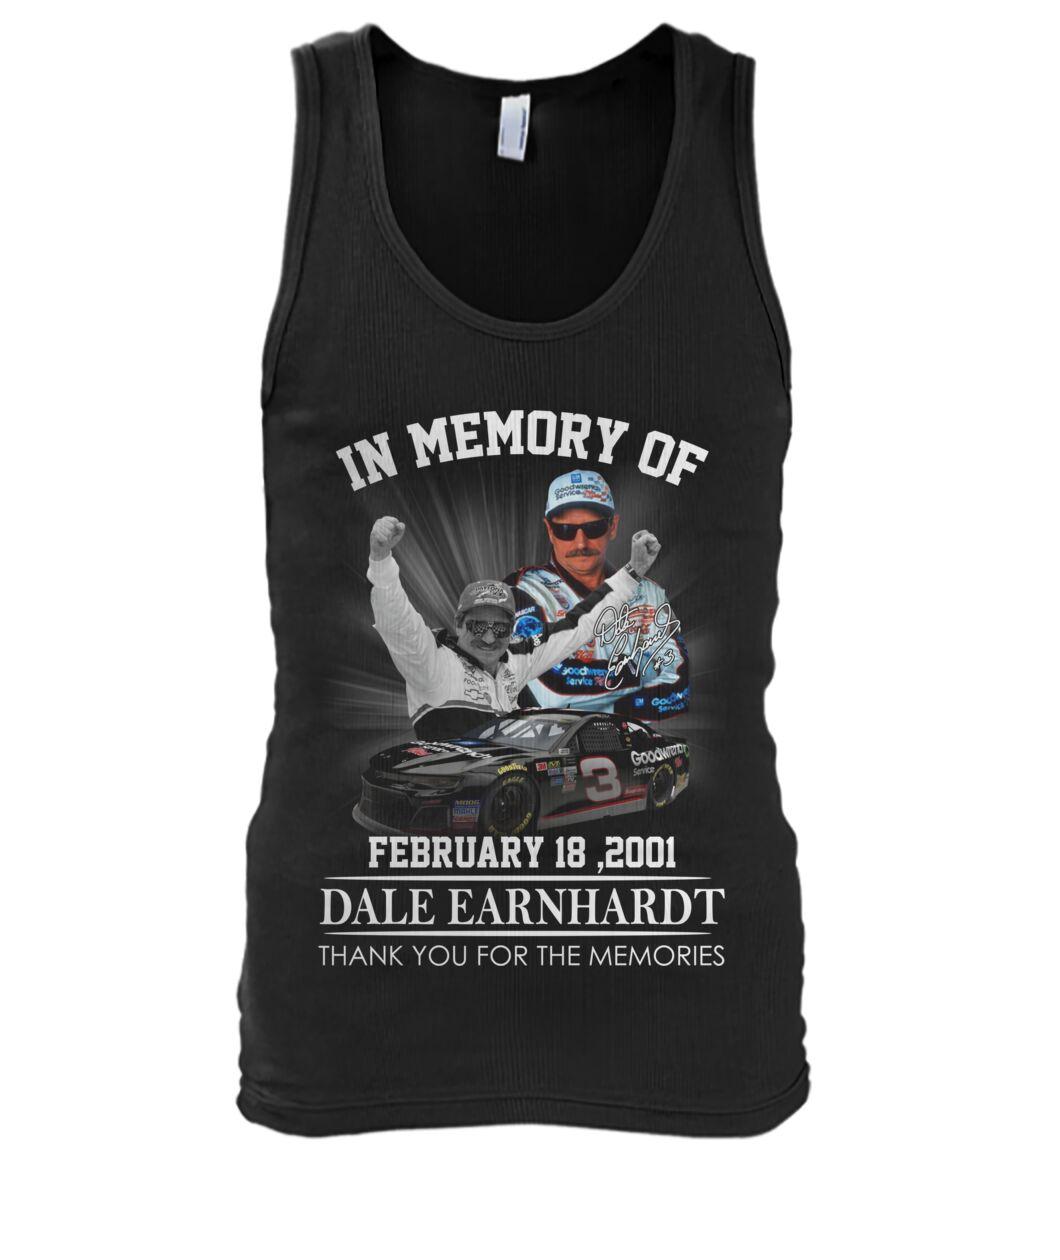 In memory of Dale Earnhardt February 18 2001 tank top